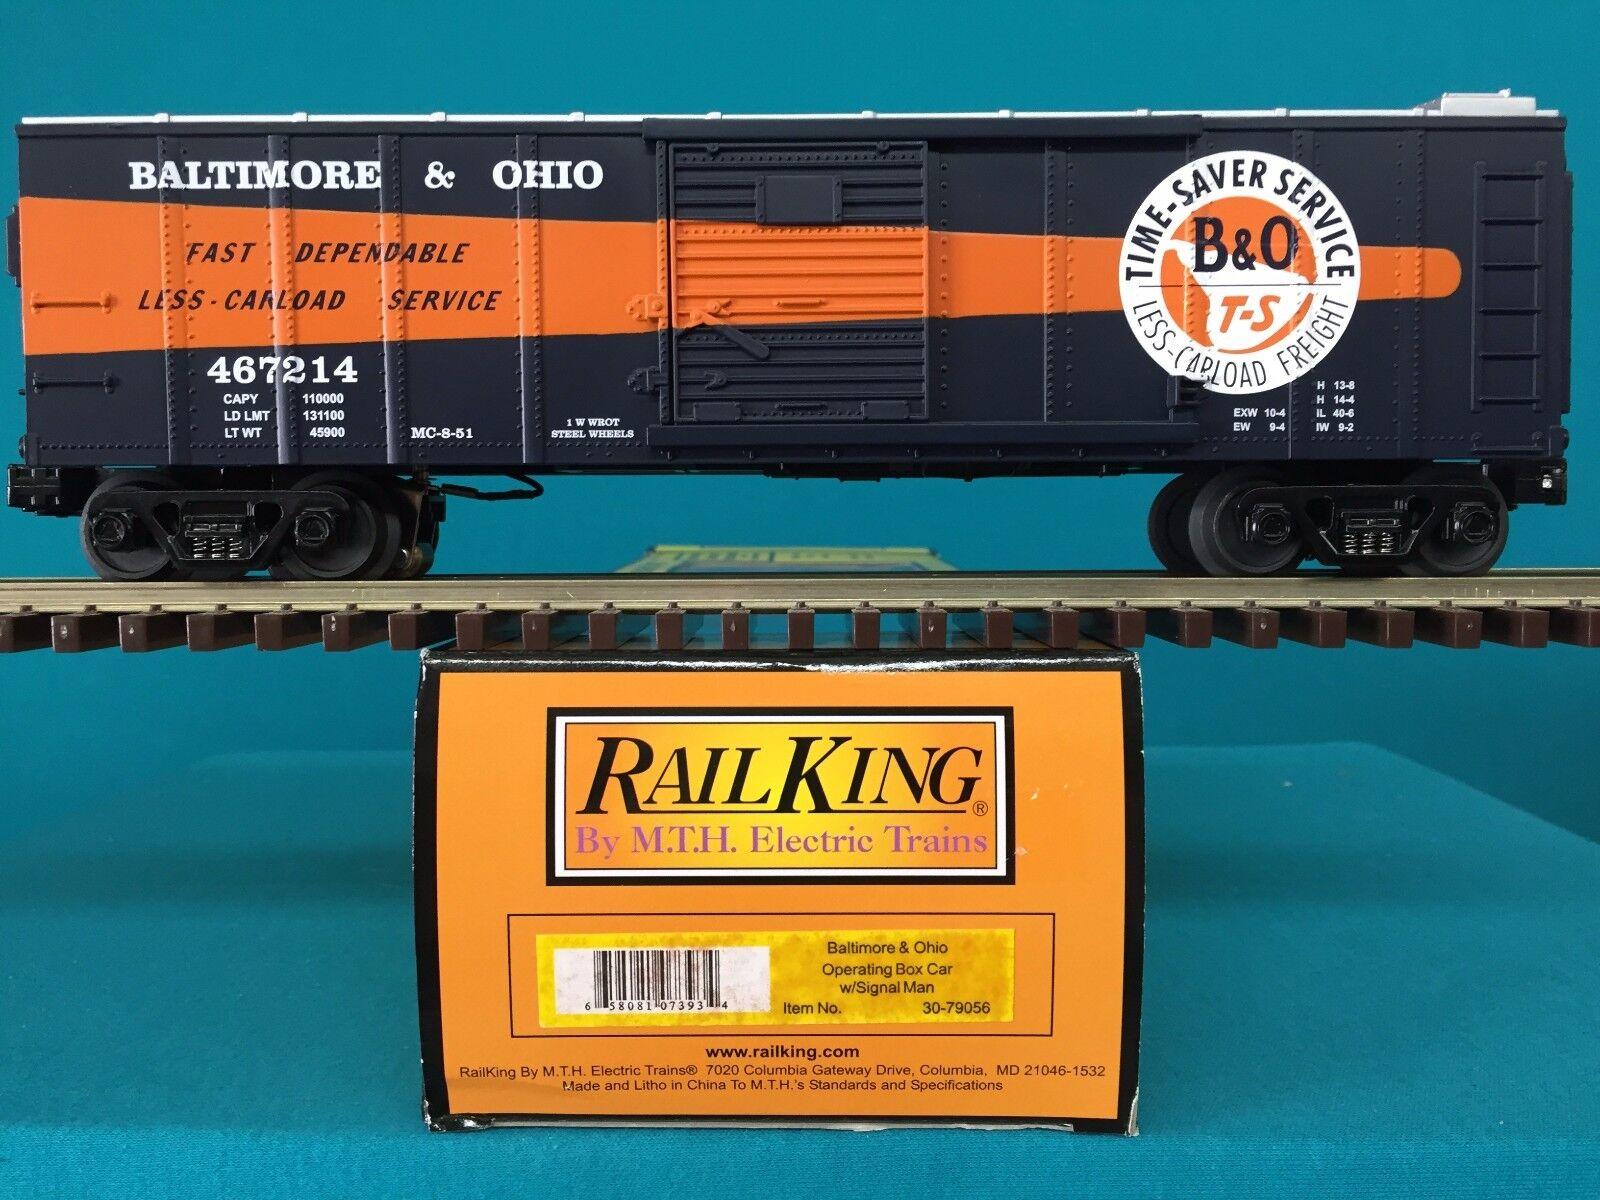 MTH Railking Box Car Baltimore & Ohio Operating Box Car w Signal Man 30-79056